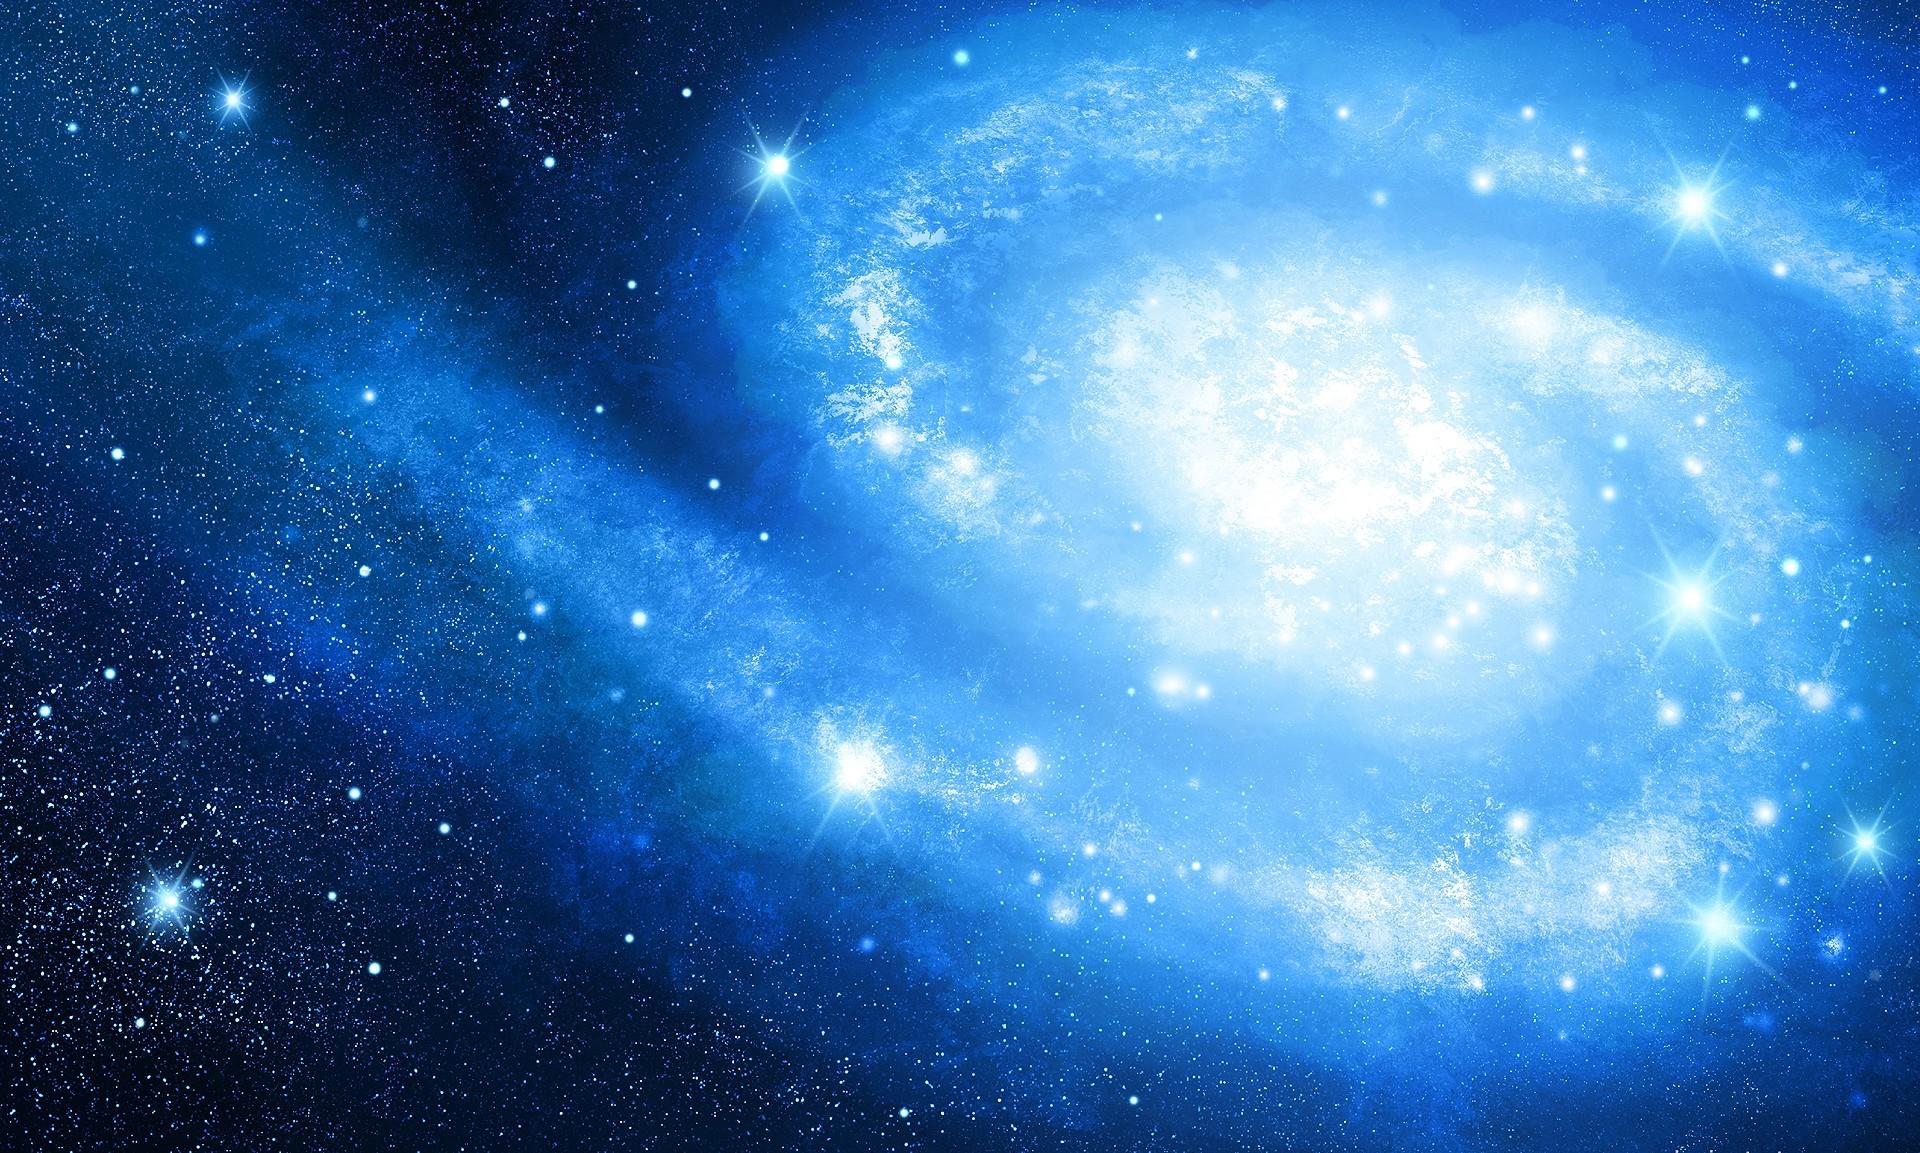 nasa high res galaxy wallpaper - photo #38